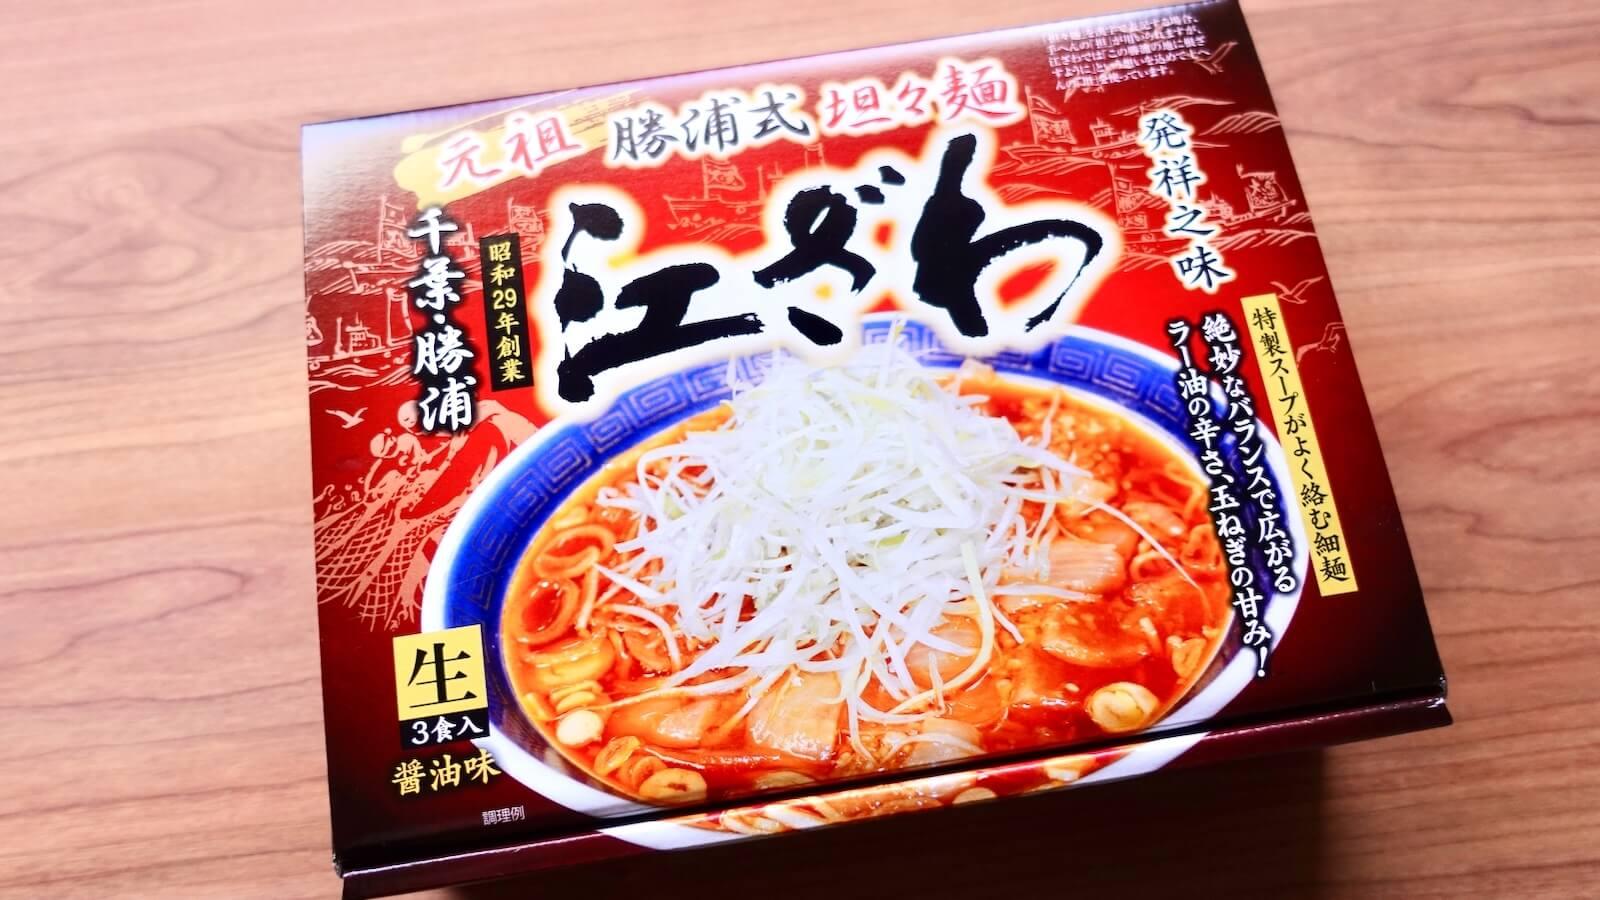 Katsuura Tantan Noodles Ezawa Instant Ramen Package